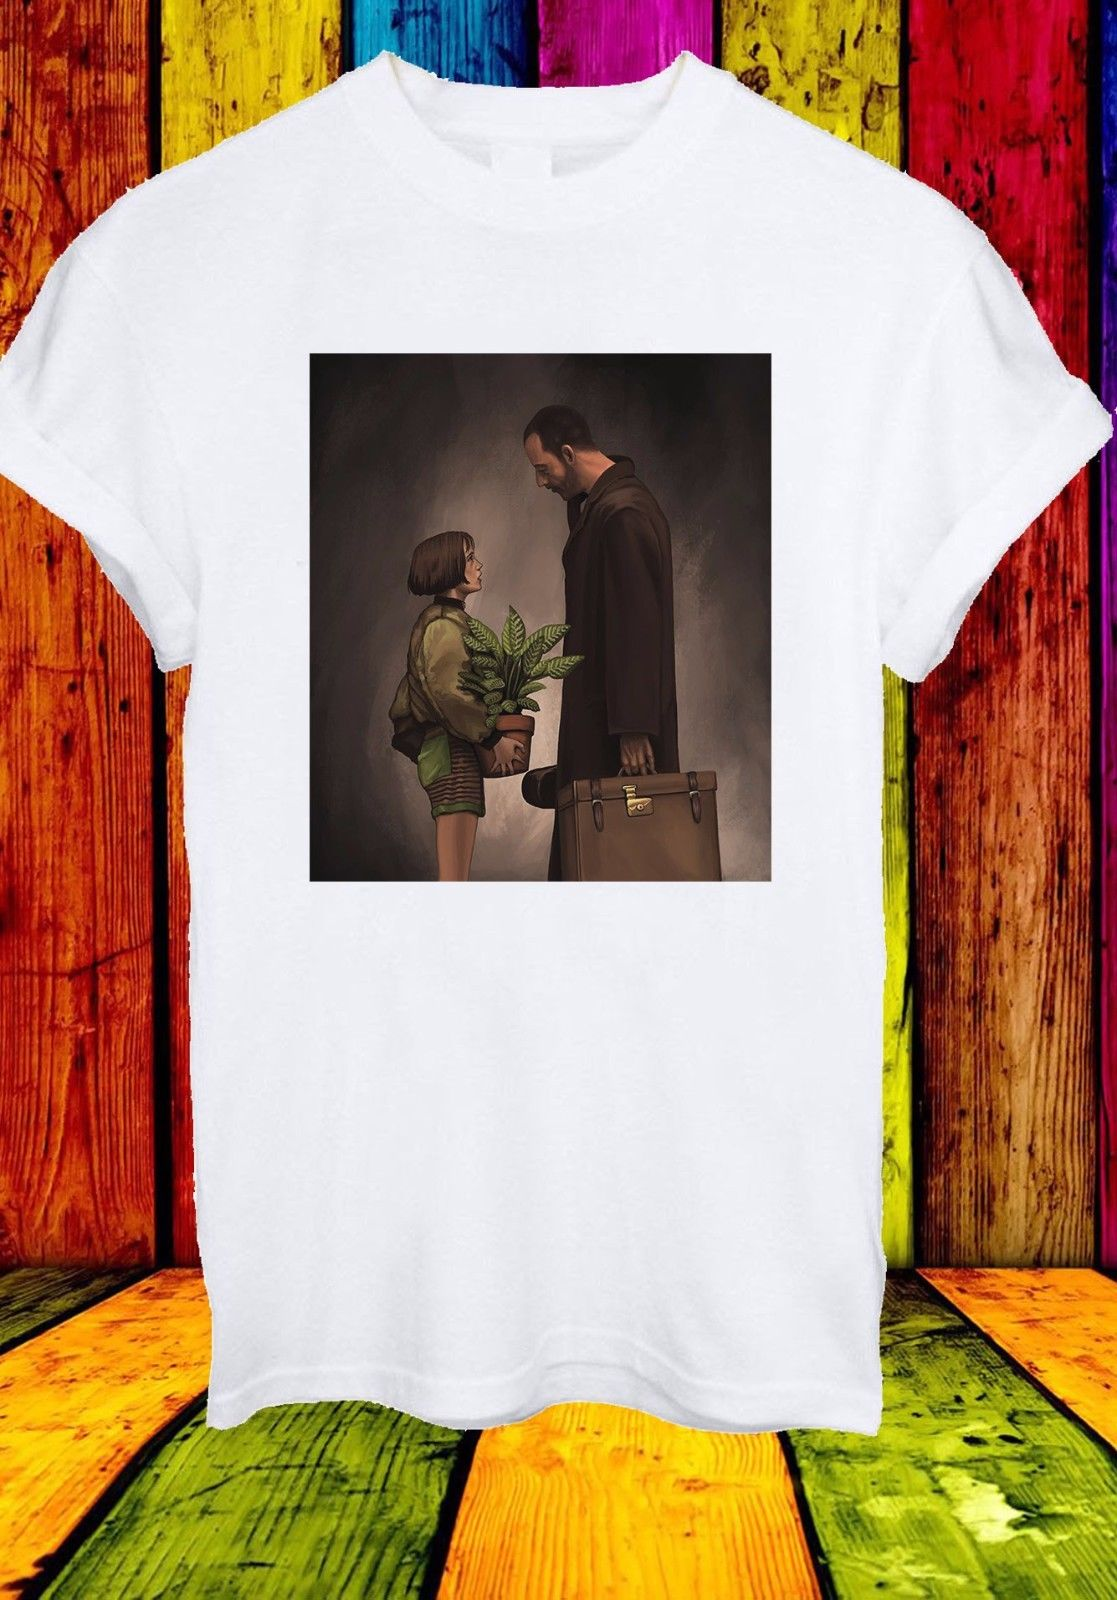 Leon Matilda The Professional Jean Reno Movie Film Men Women Unisex T-shirt 756 New T Shirts Funny Tops Tee New Unisex Funny